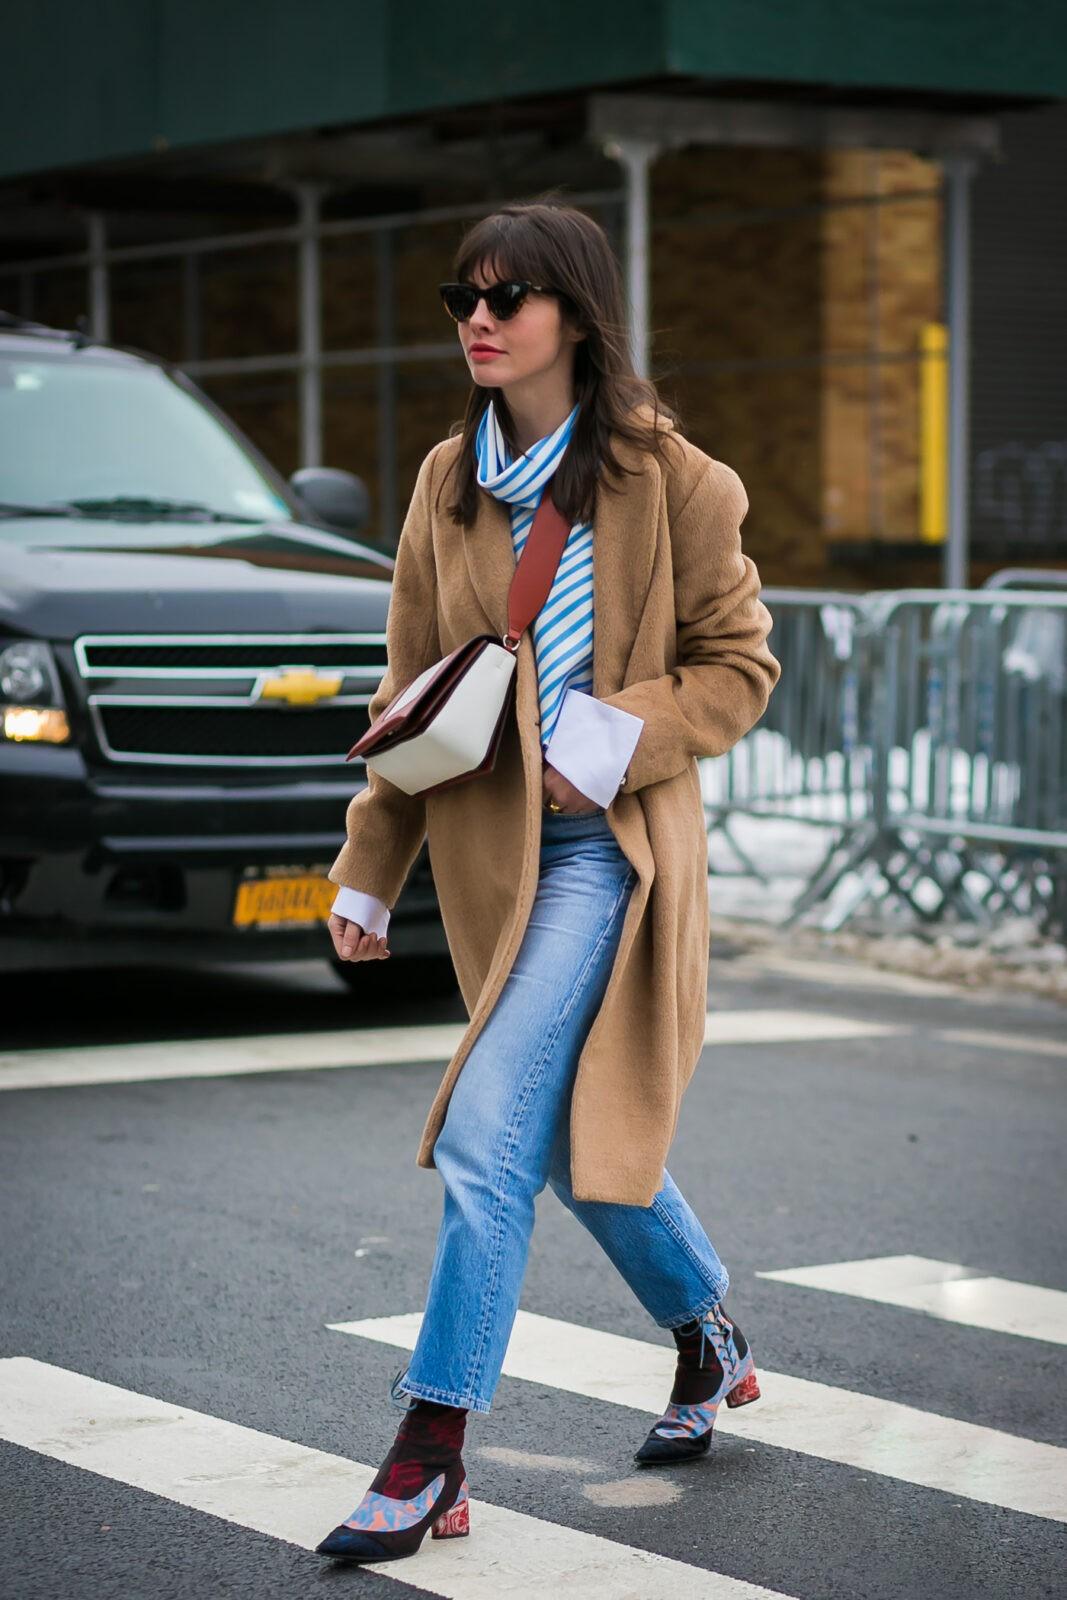 kat collings thumb edit seven camel coat stylebook january 2019